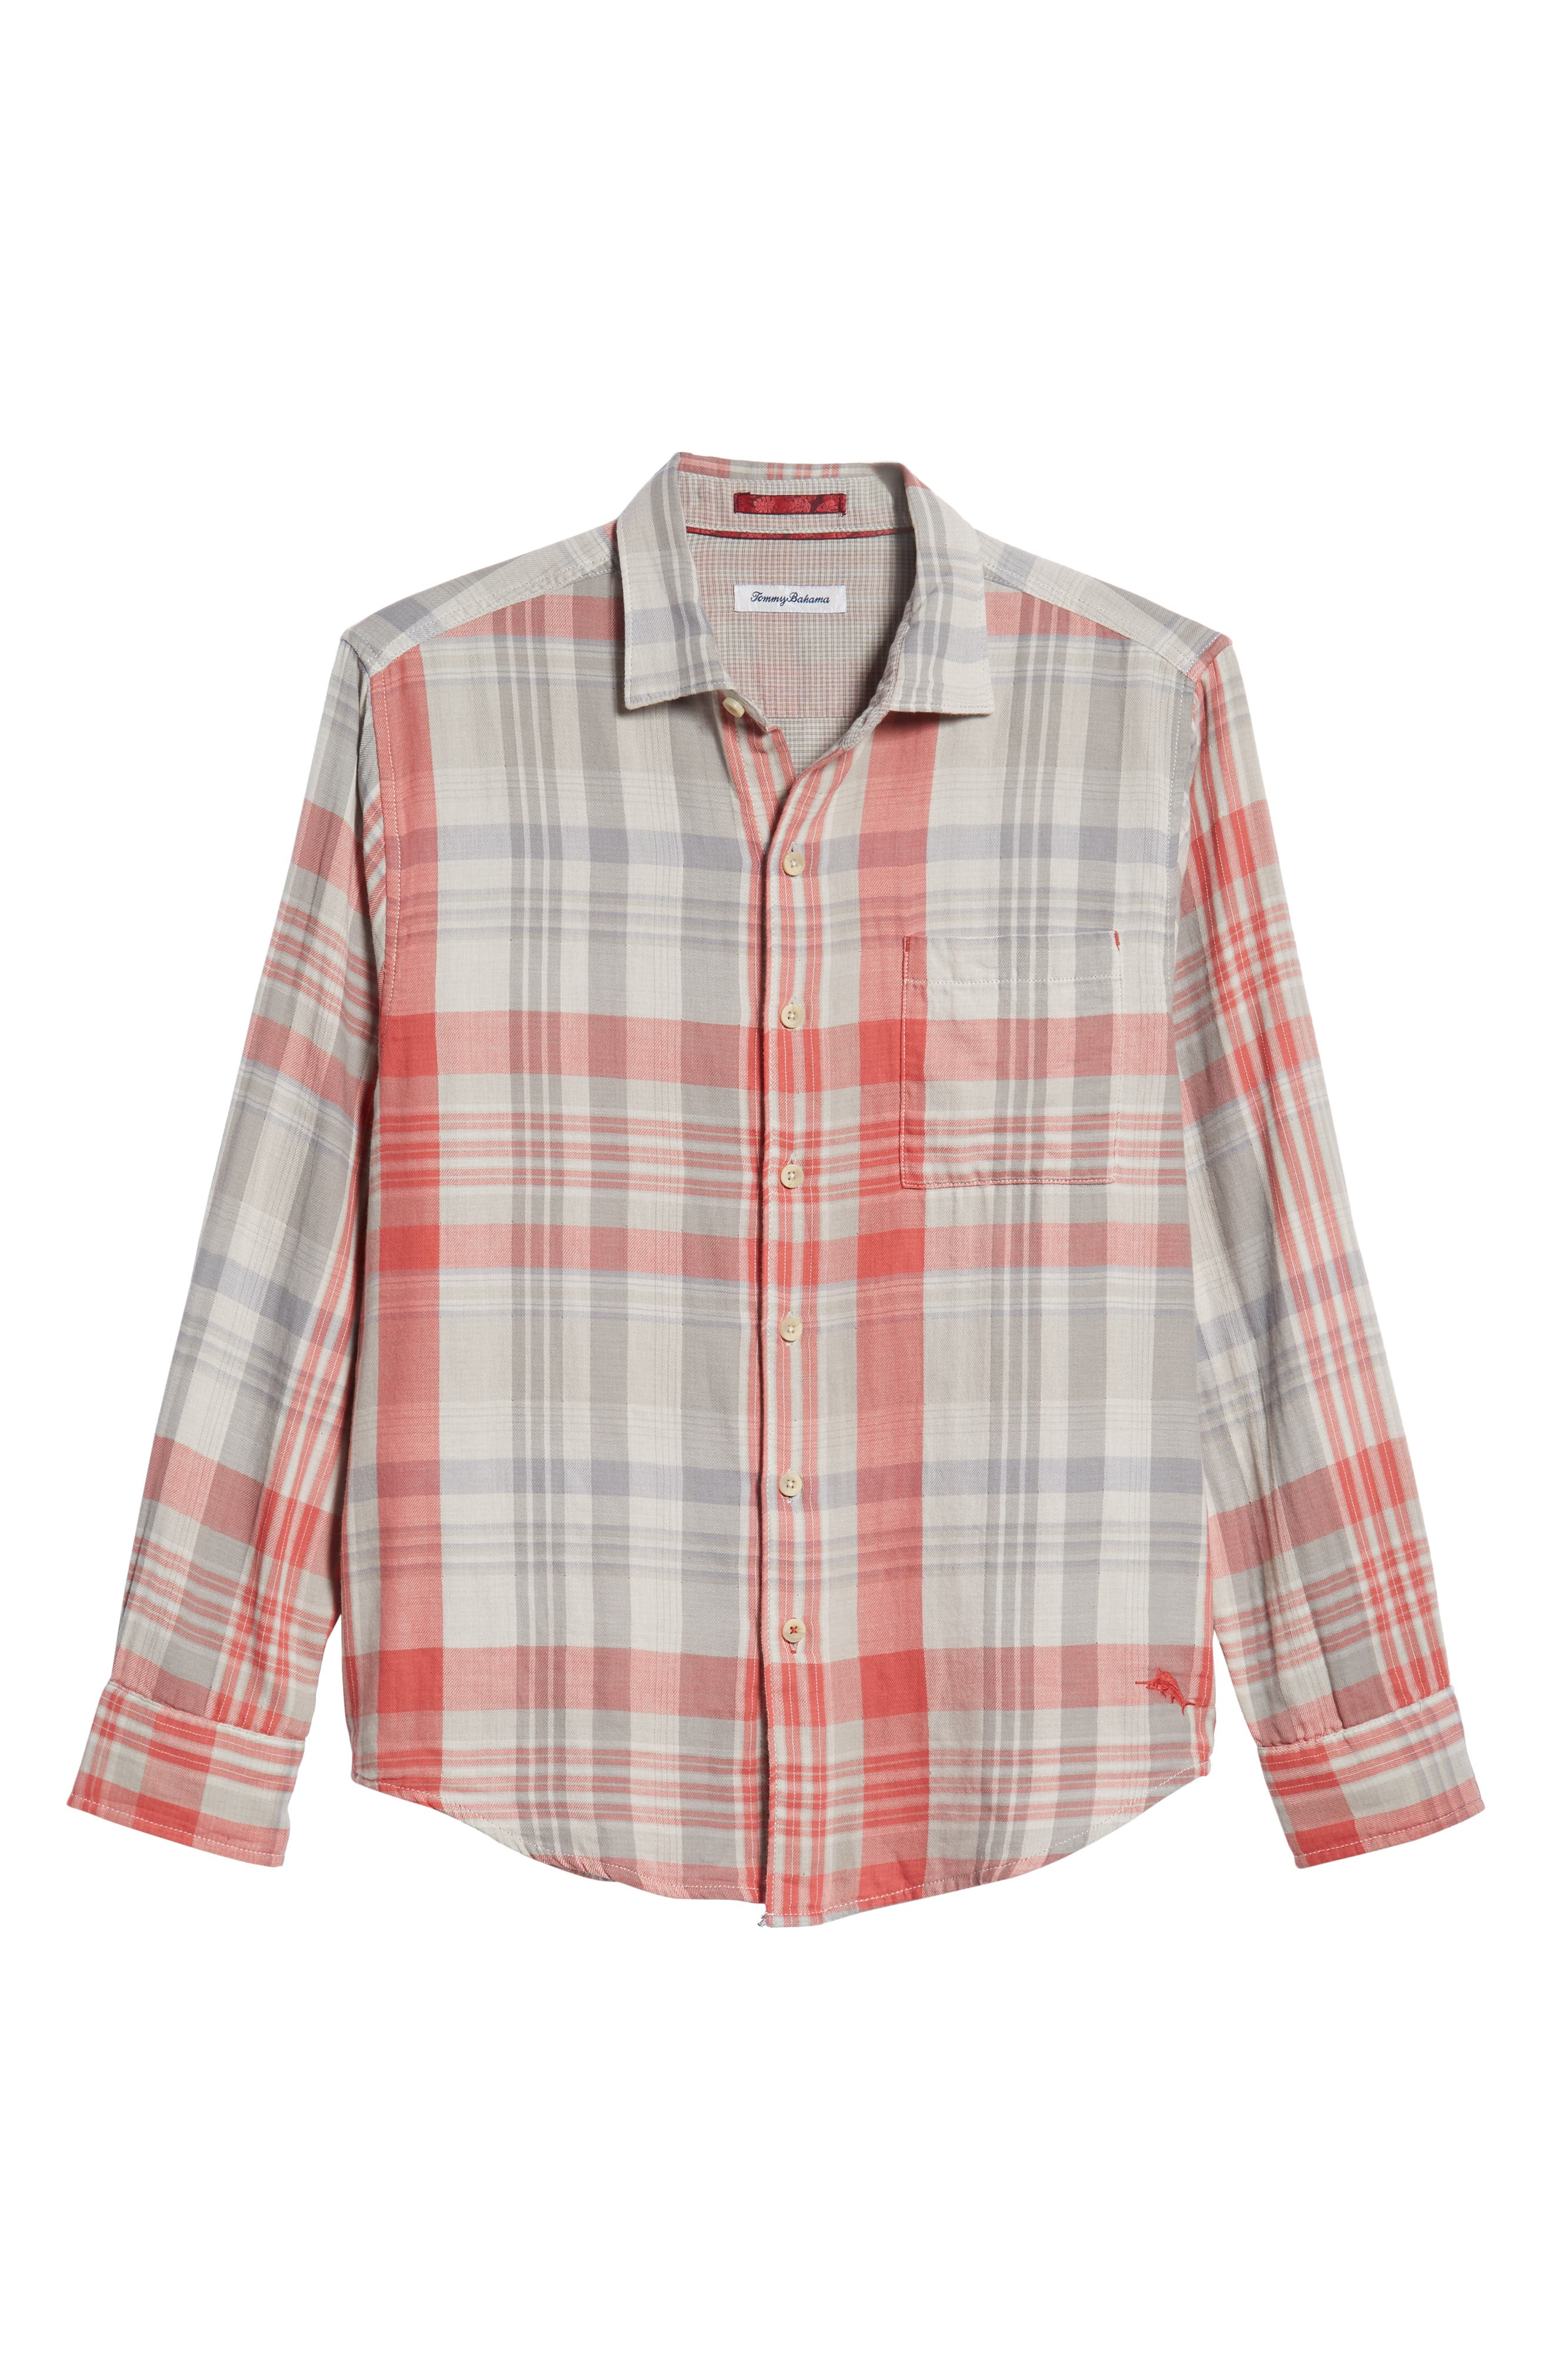 Monteverde Madras Regular Fit Shirt,                             Alternate thumbnail 5, color,                             POINCIANA